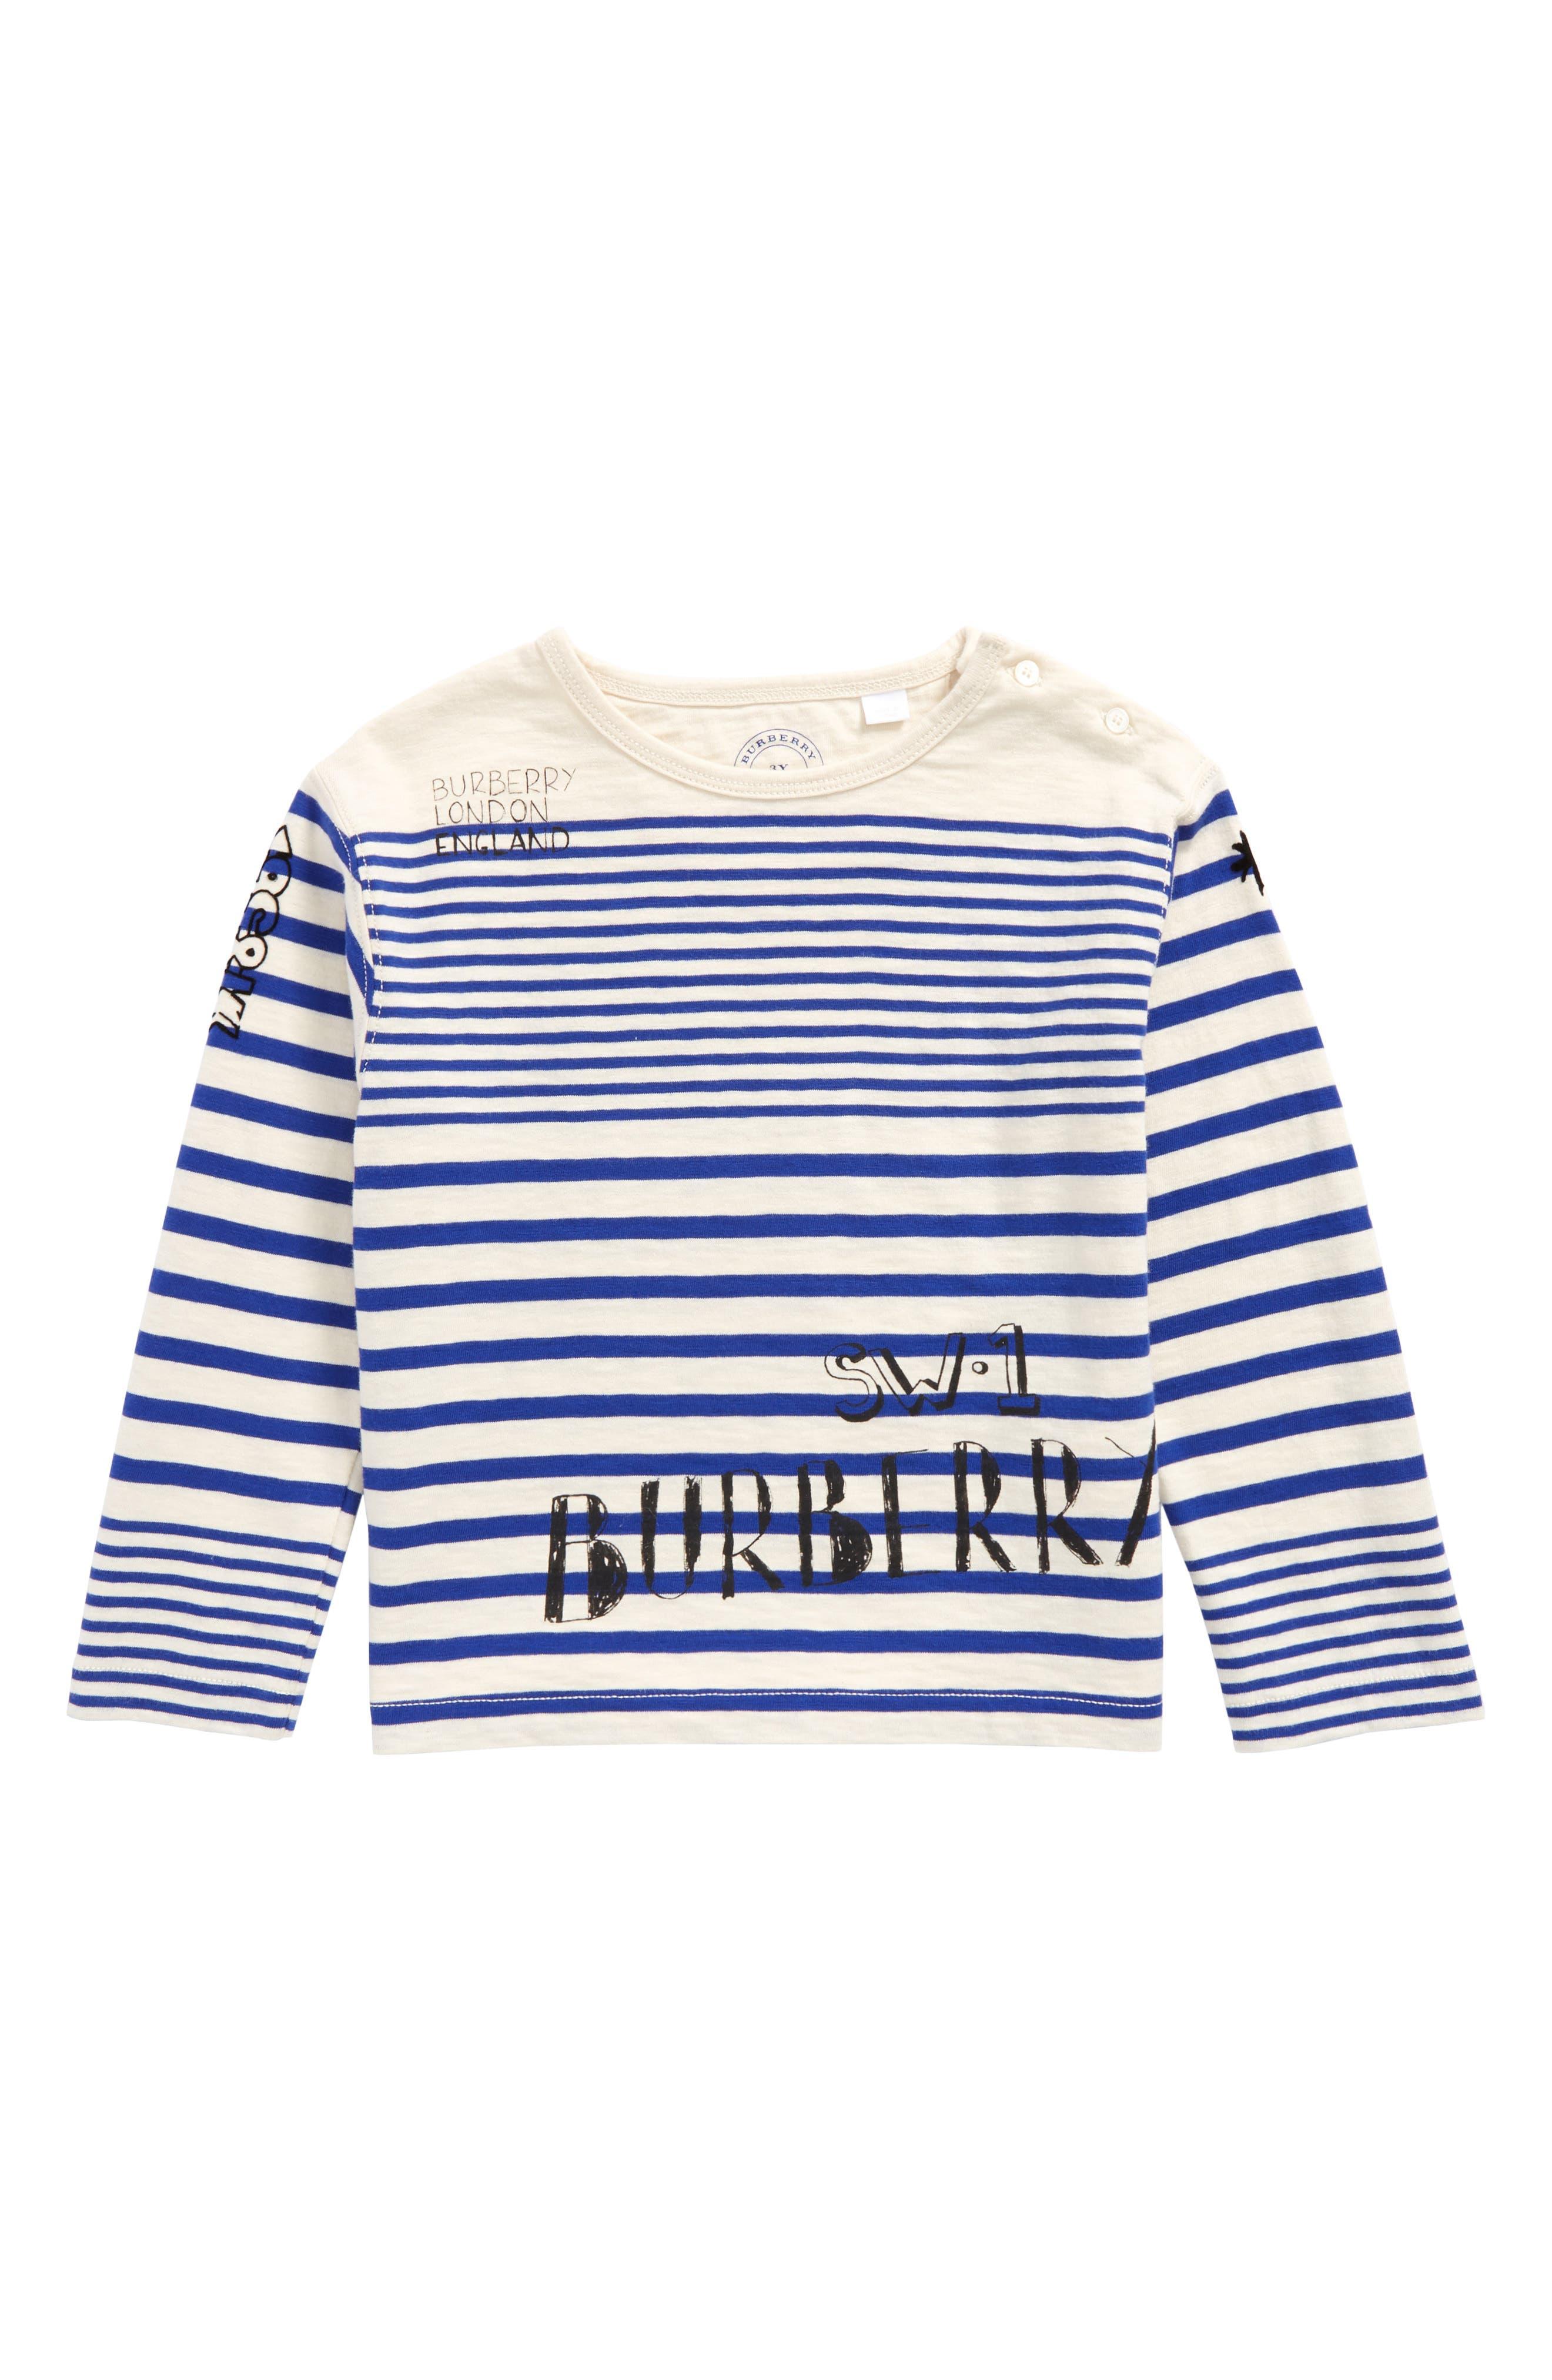 Burberry Stripe T-Shirt (Toddler Boys)